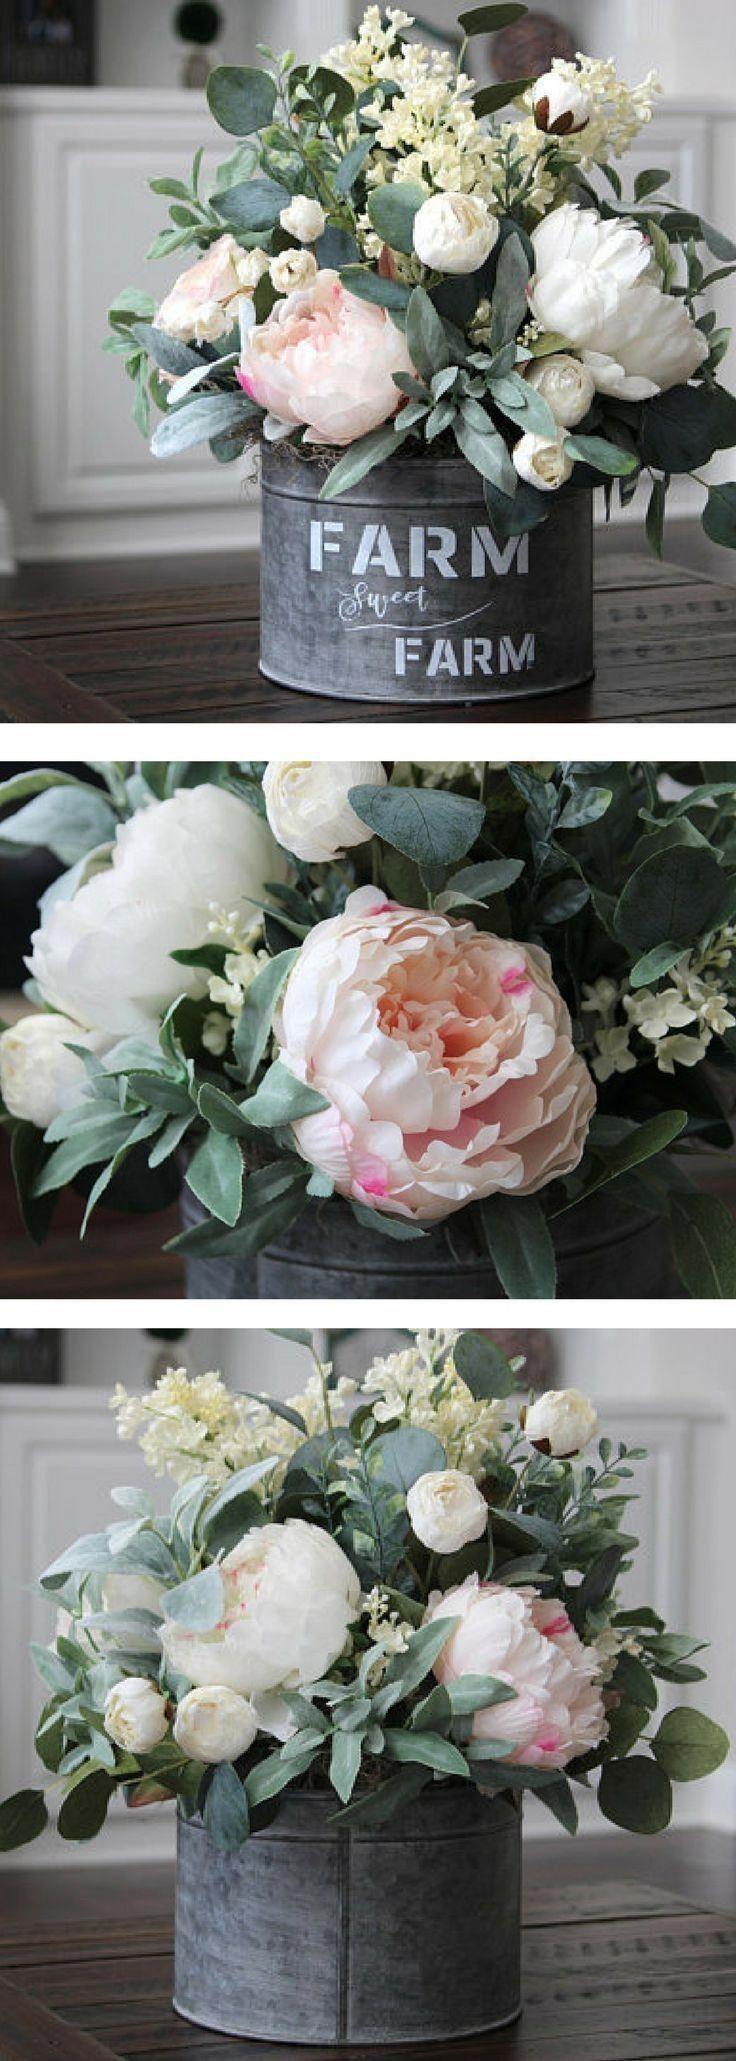 Photo of ? @eclectic_vibes pink & white farmhouse flower arrangement #farmhouseset